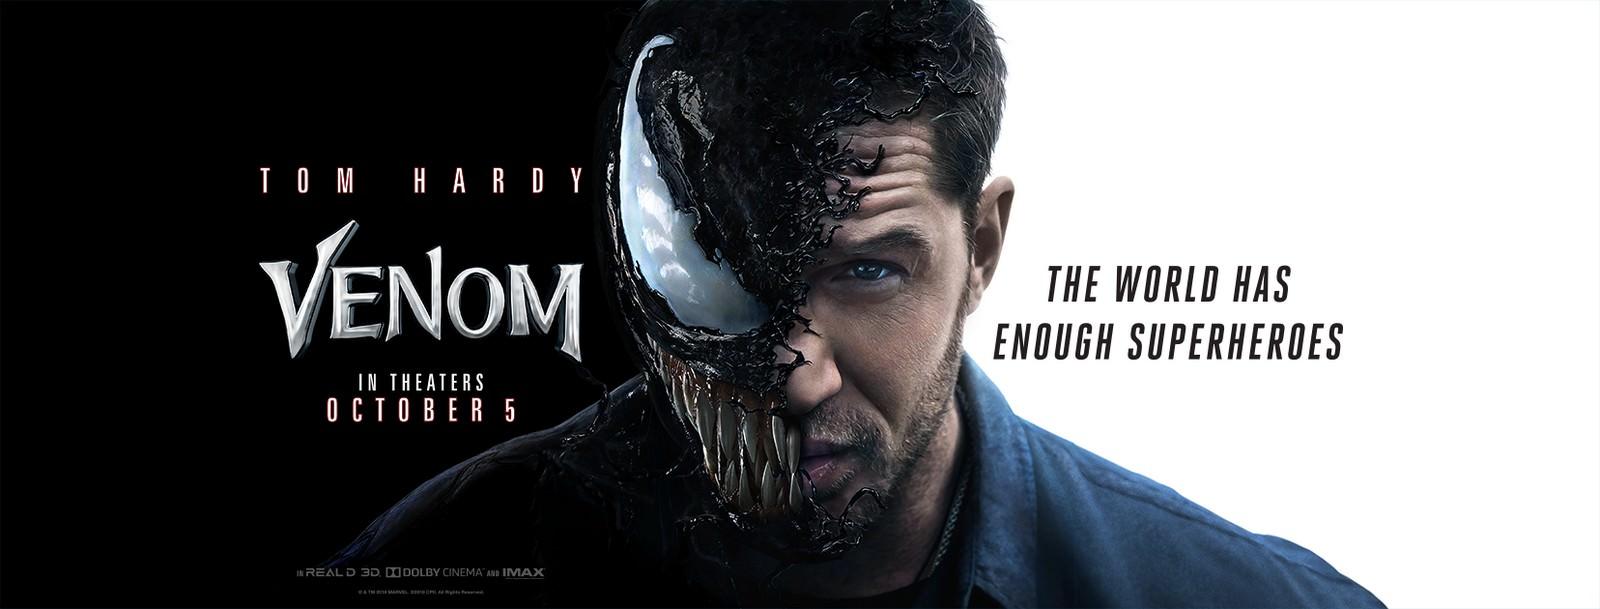 Movie, Venom(美國, 2018年) / 猛毒(台灣) / 毒液:致命守护者(中國) / 毒魔(香港), 電影海報, 美國, 橫版